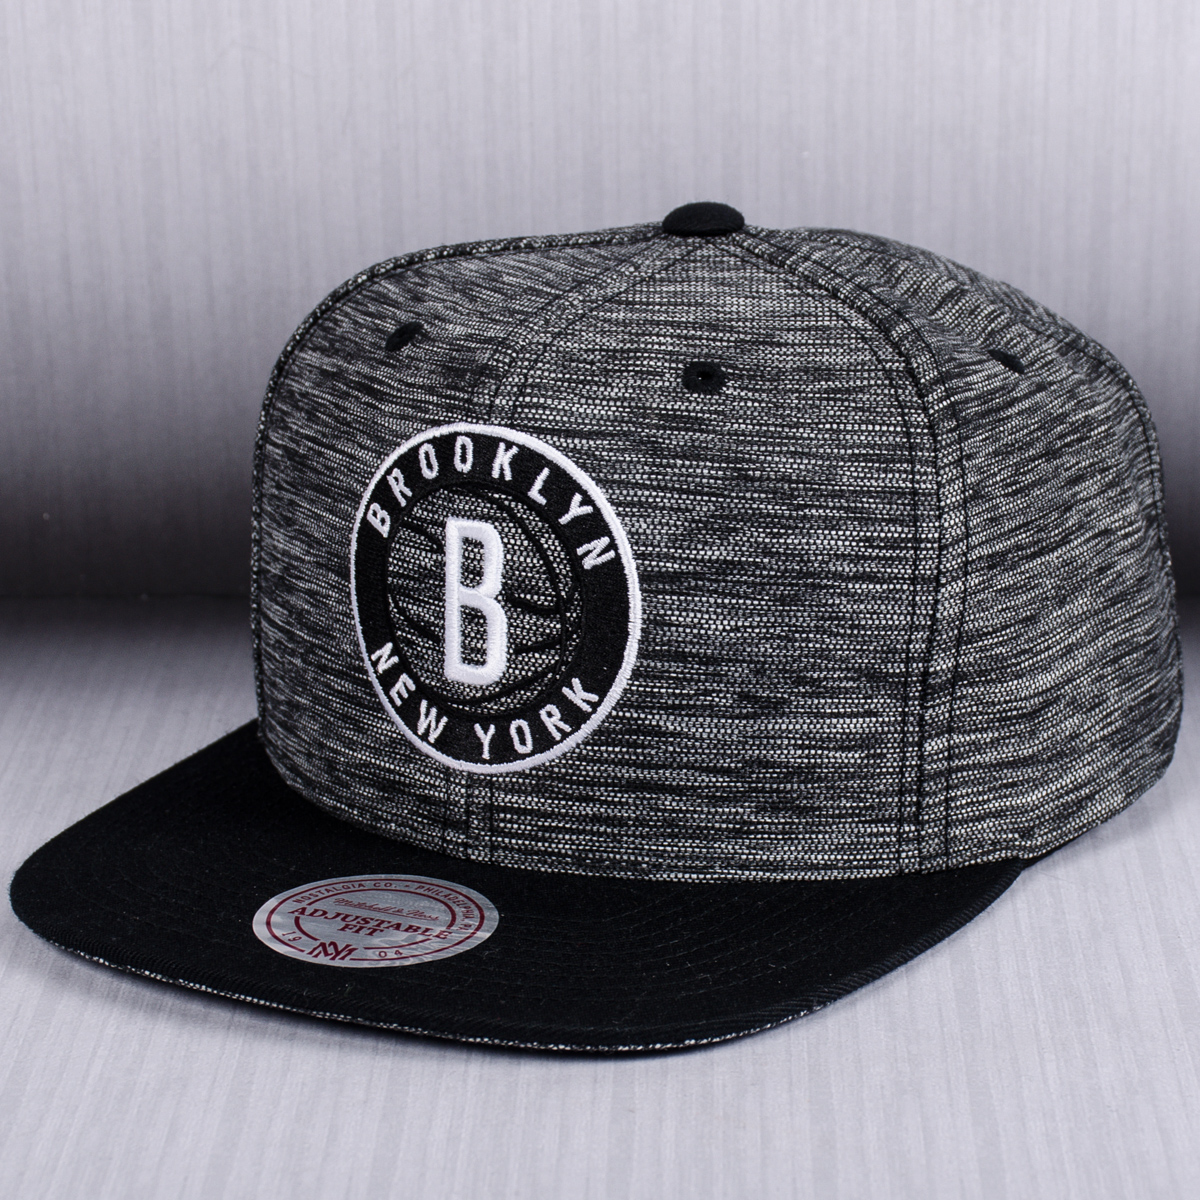 1729ccffaf1688 Mitchell & Ness NBA Brooklyn Nets Prime Knit Snapback Cap - NBA Shop ...